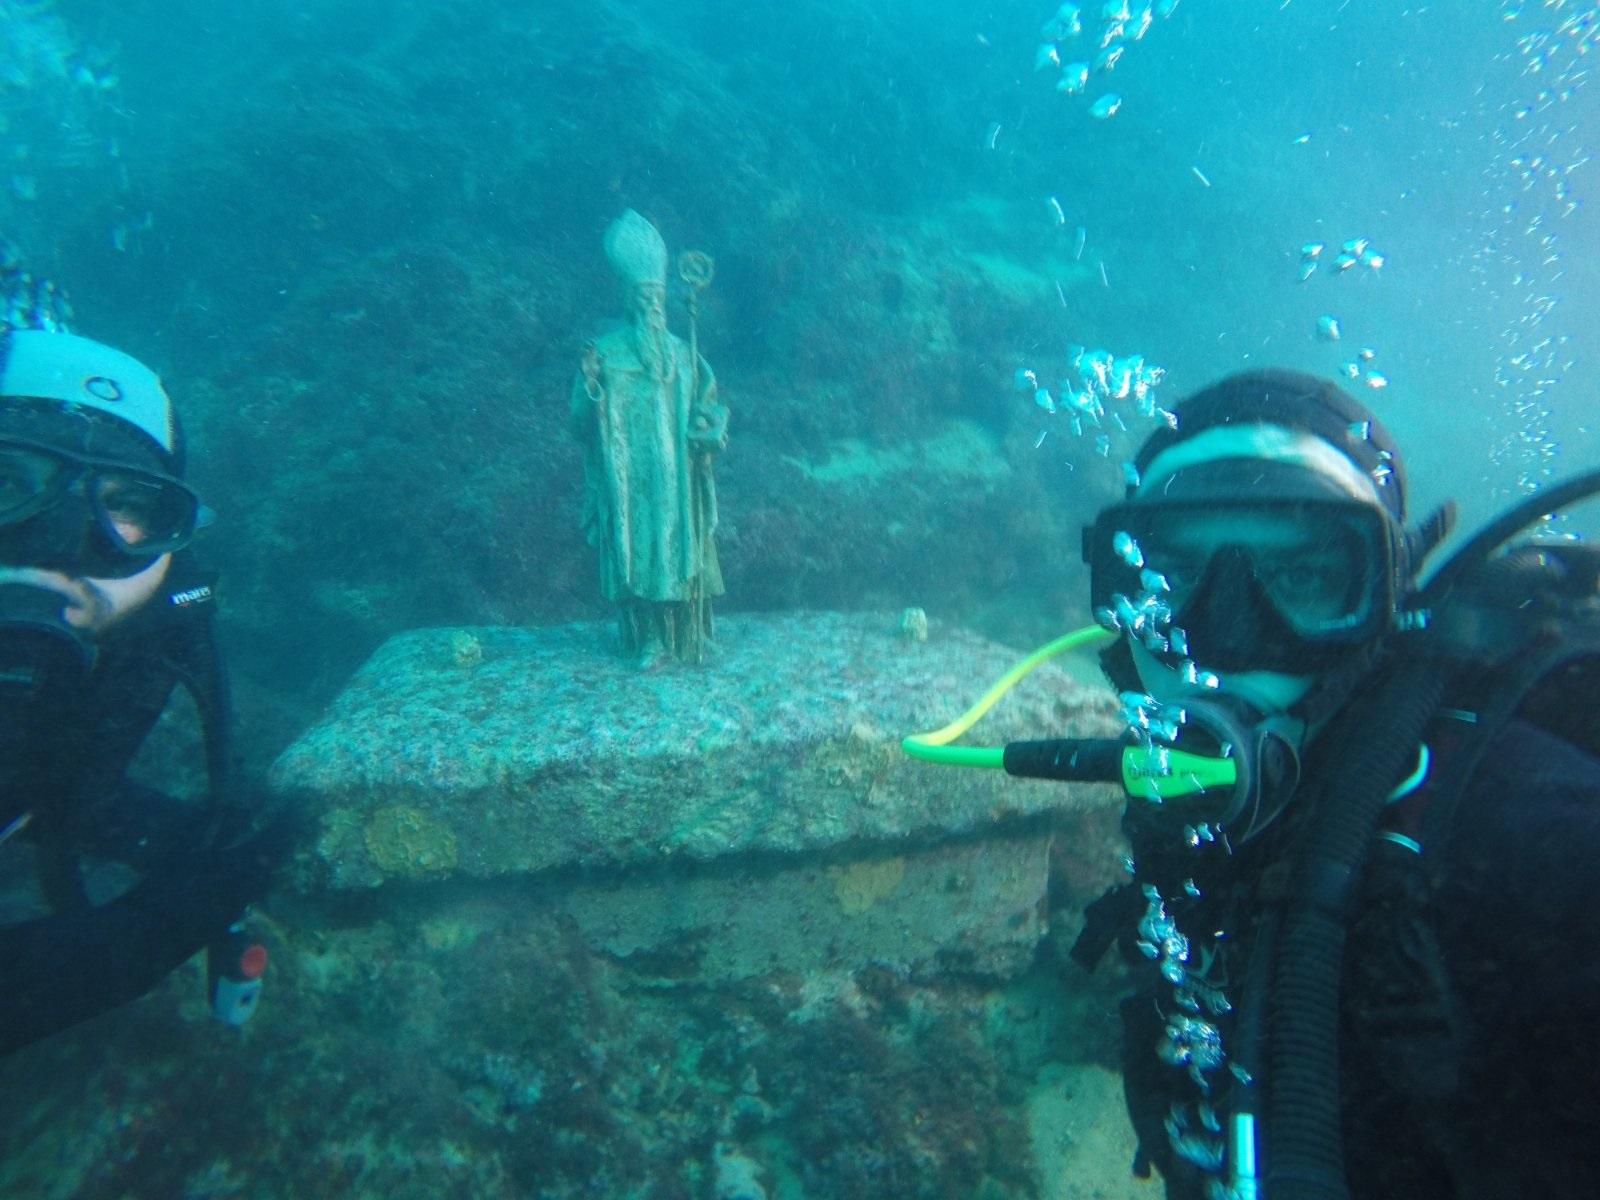 Mladi jaskanski grkokatolici zaronili pod more u čast Svetog Nikole